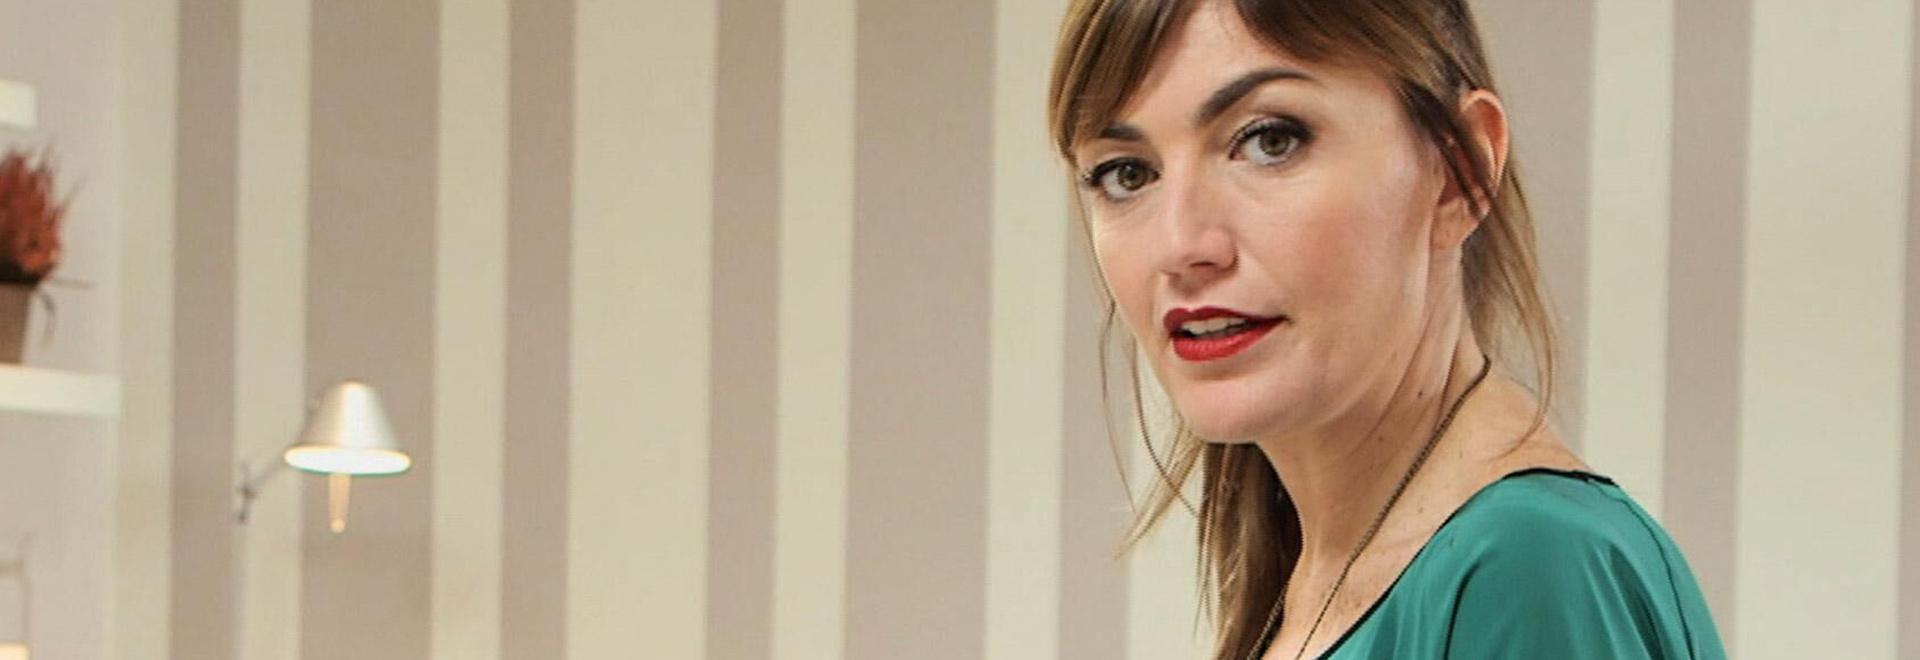 Chiara Maci #VitadaFoodblogger